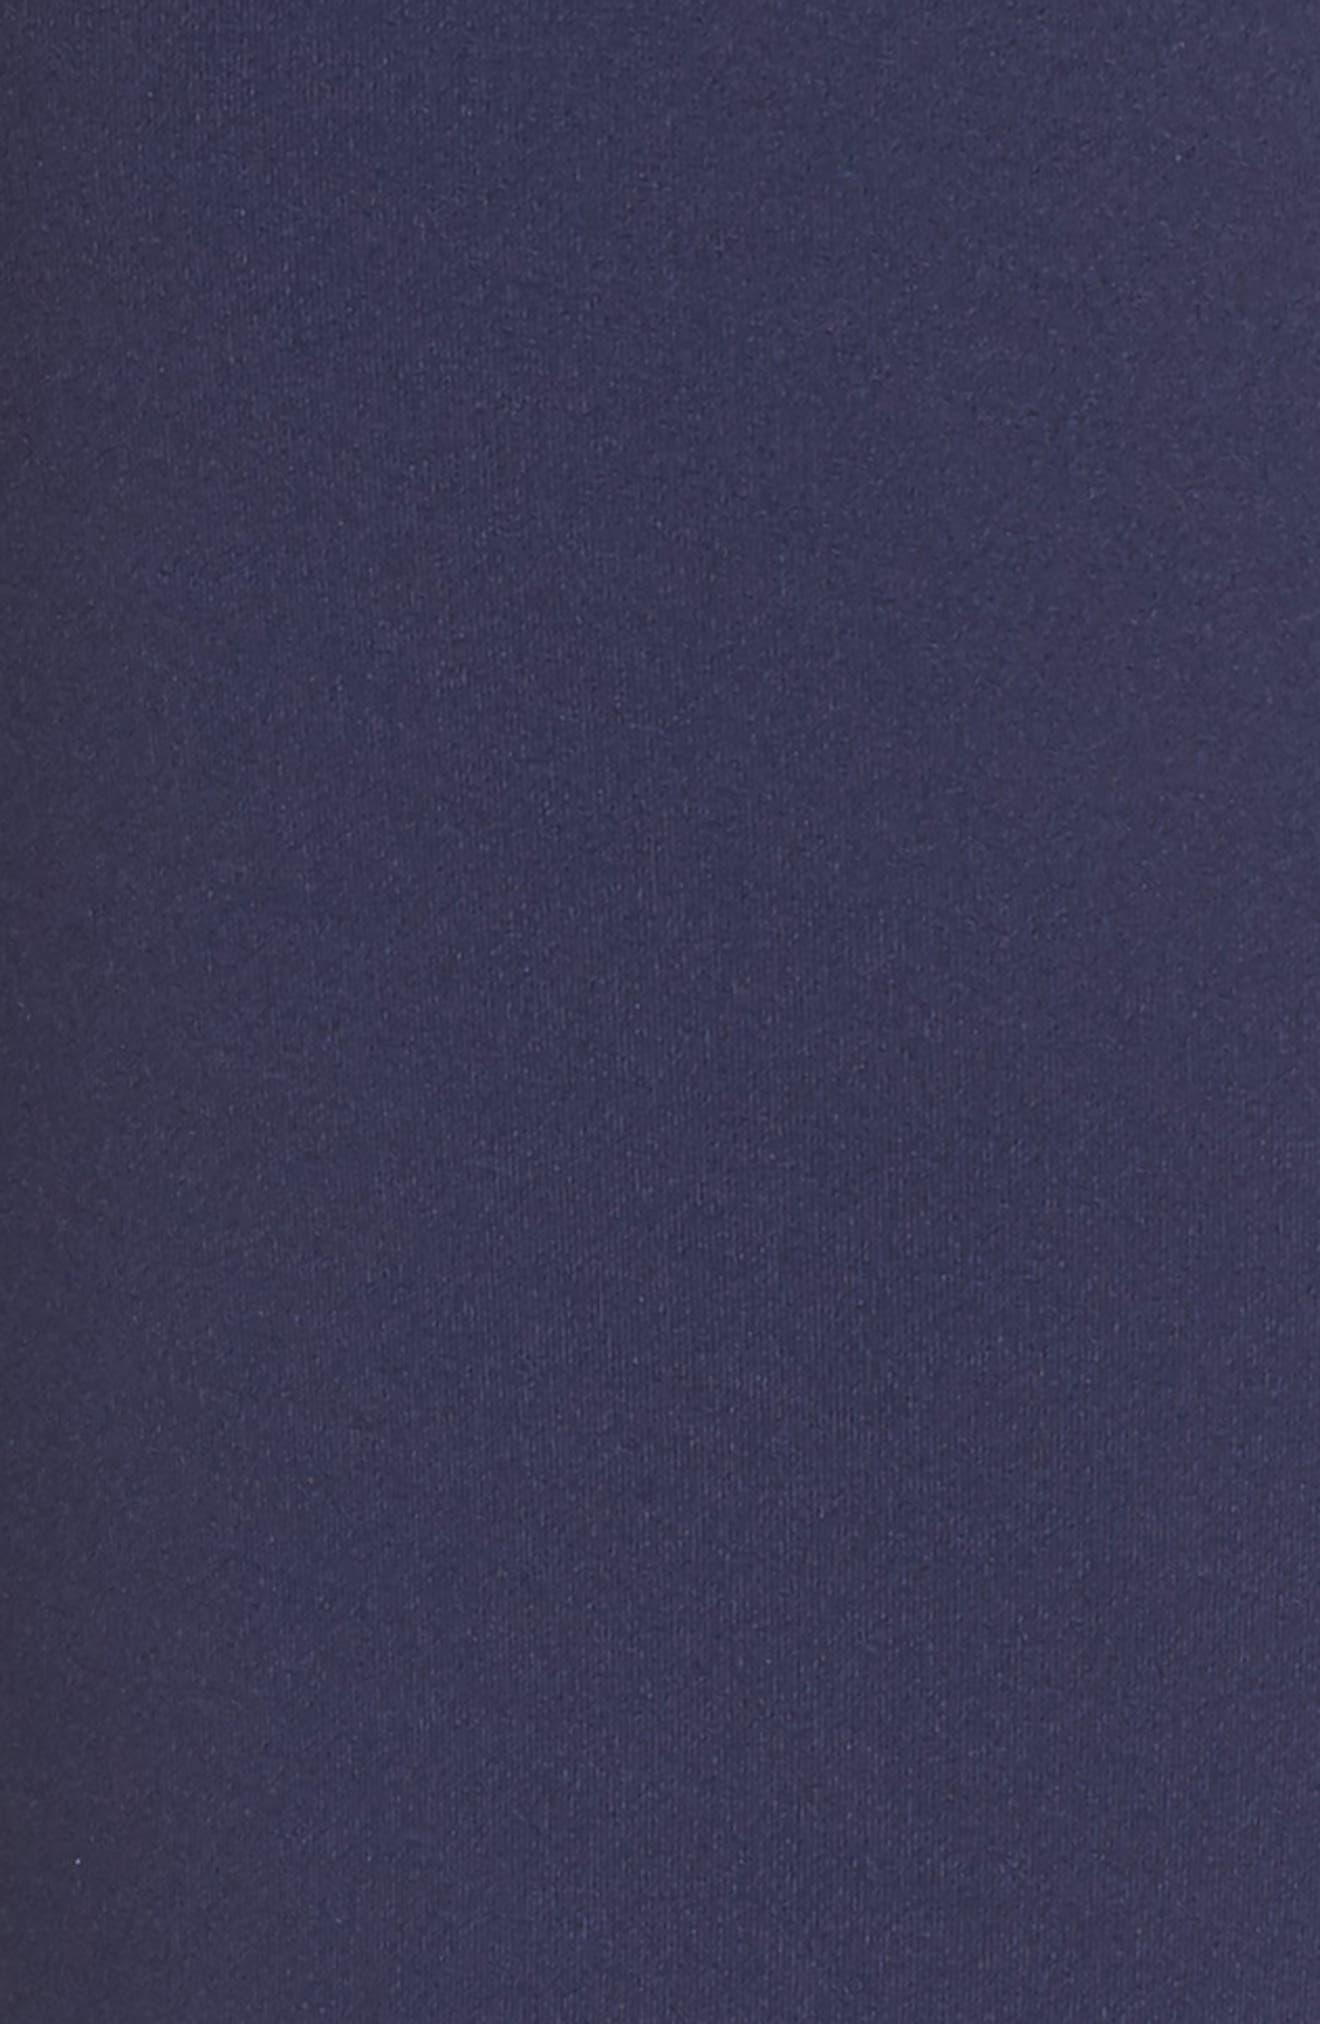 Limitless Leggings,                             Alternate thumbnail 6, color,                             Navy